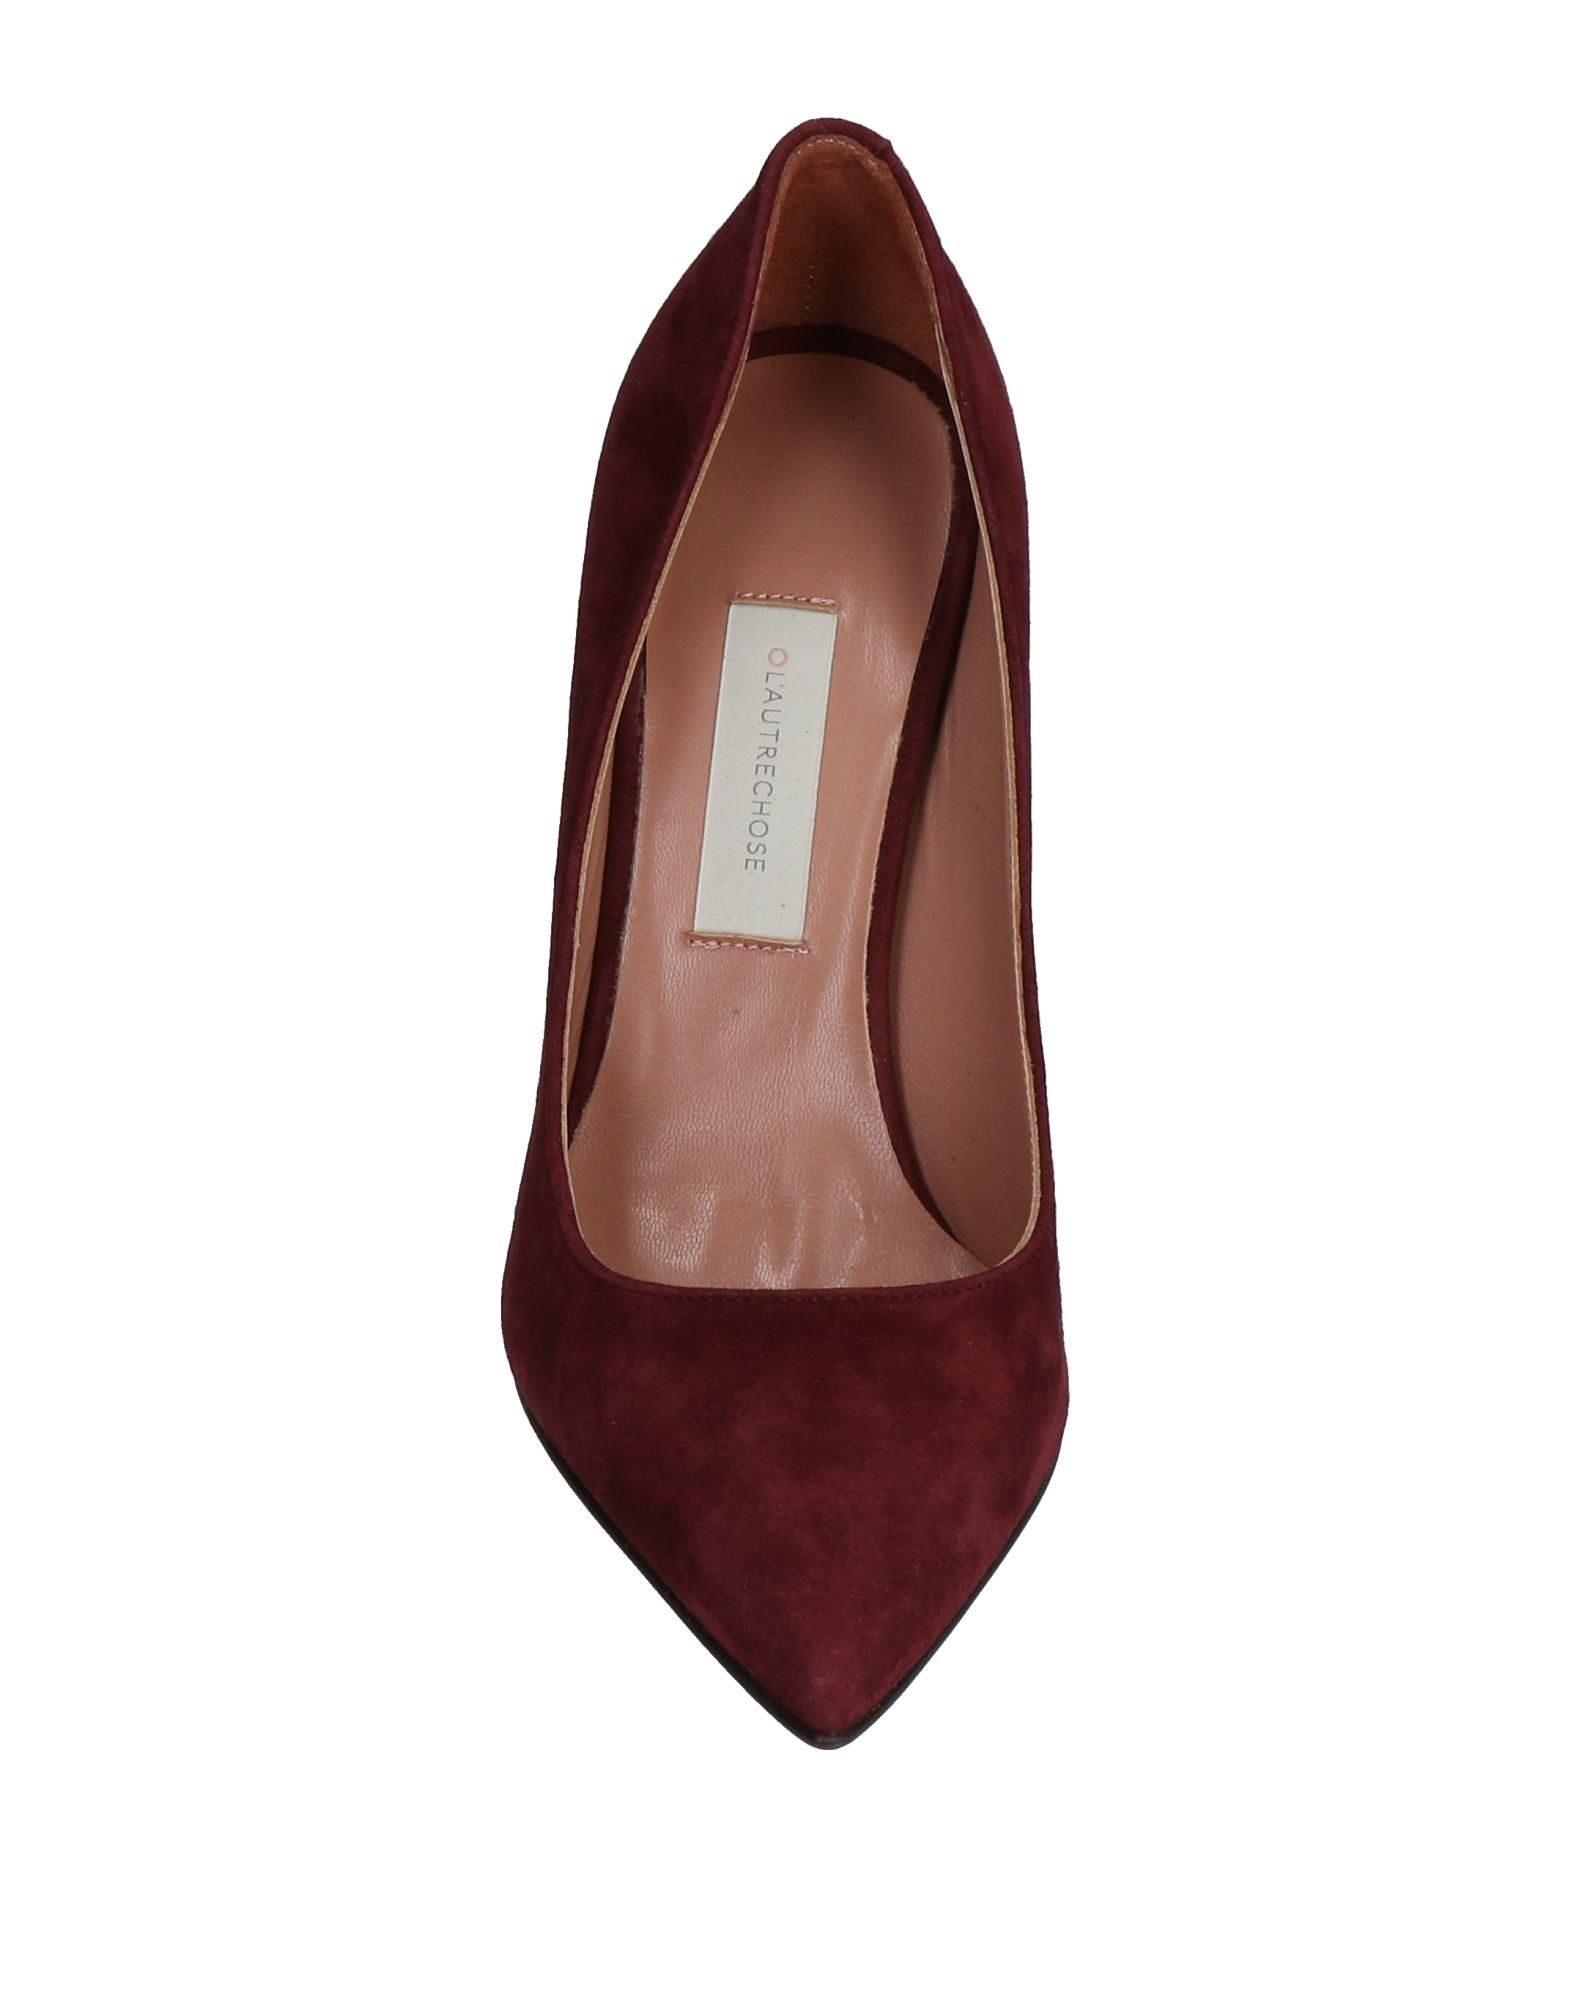 Stilvolle billige Schuhe Damen L' Autre Chose Pumps Damen Schuhe  11267872HH 5ef98c